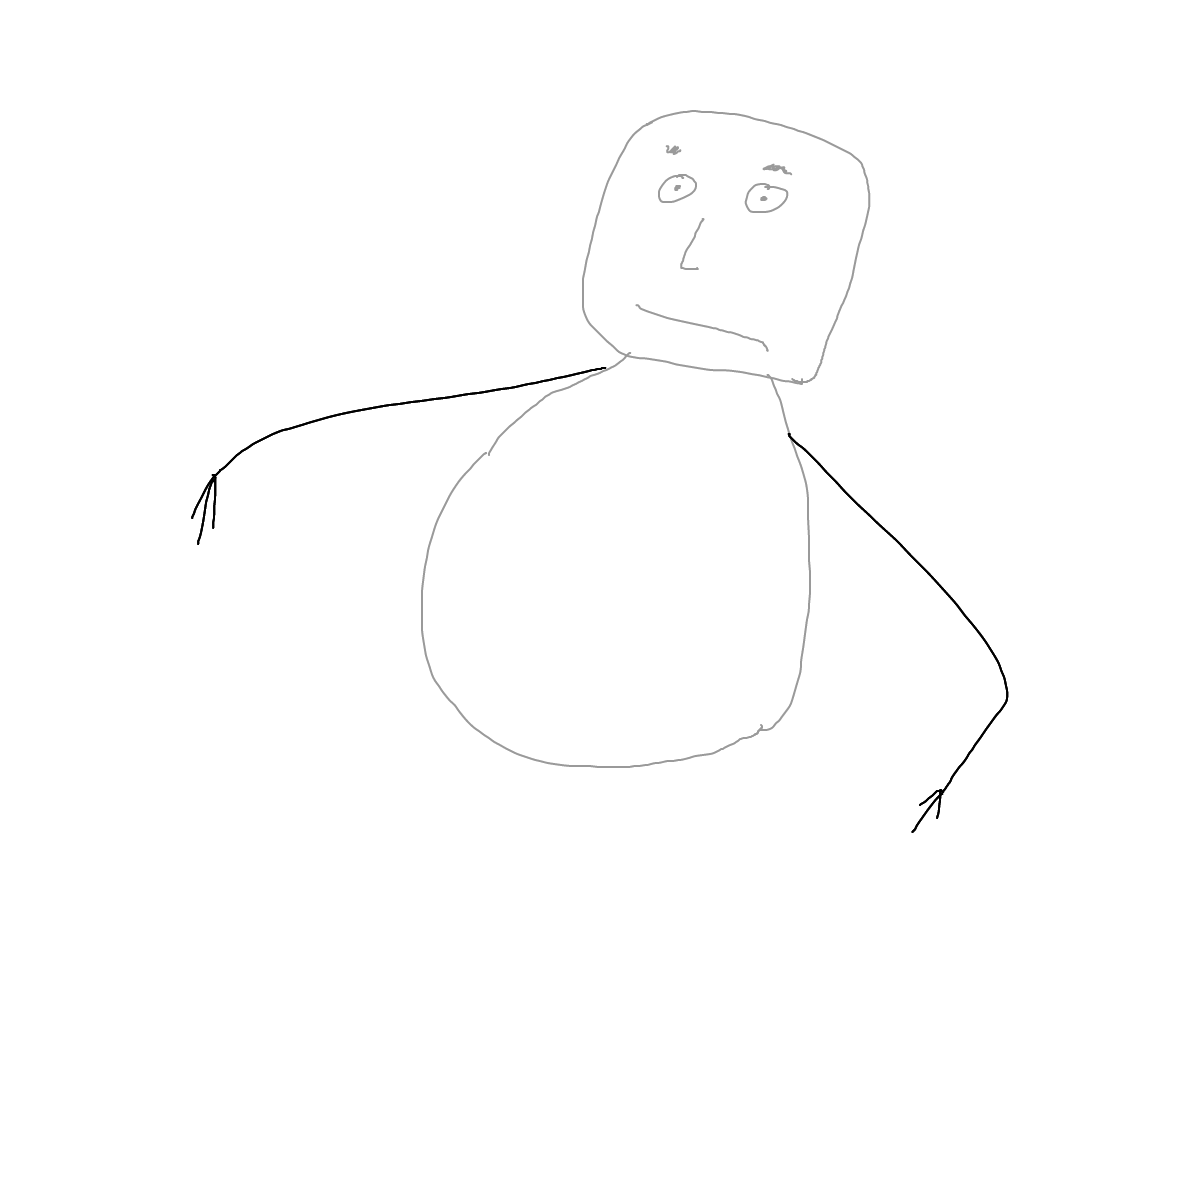 BAAAM drawing#50 lat:52.4751243591308600lng: 13.4067316055297850